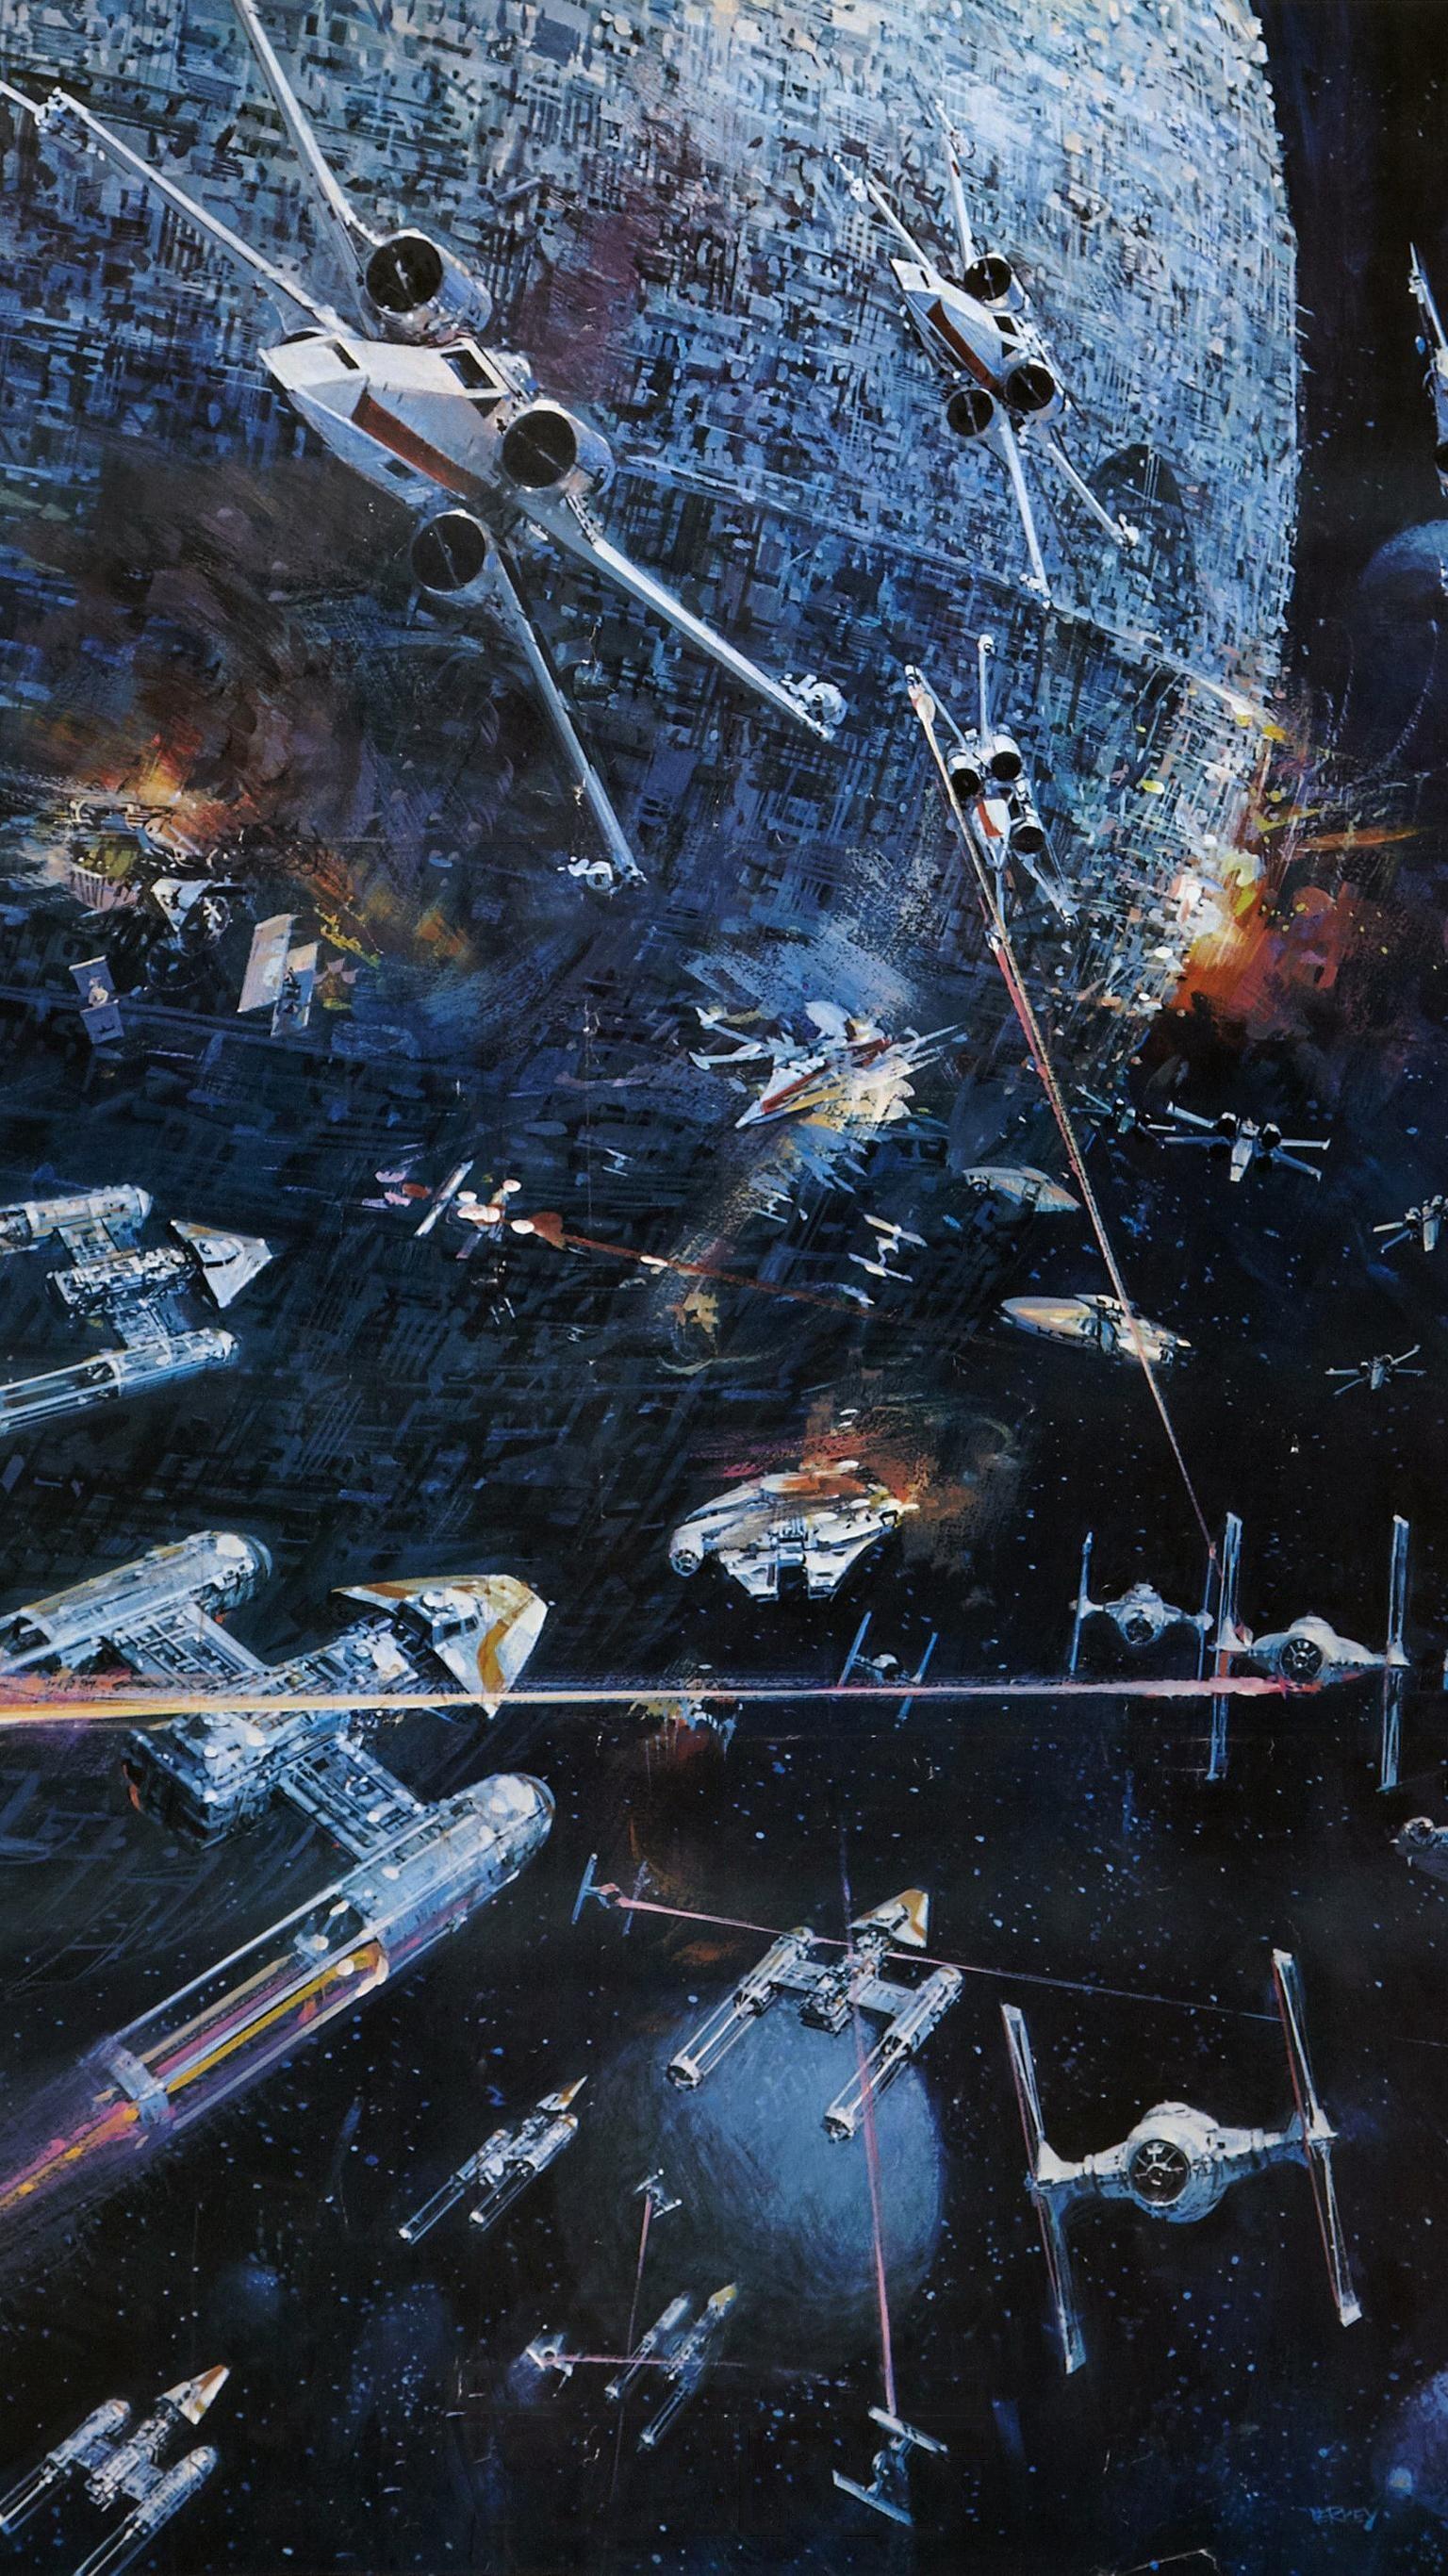 Star Wars 1977 Phone Wallpaper Background Star wars concept 1536x2732